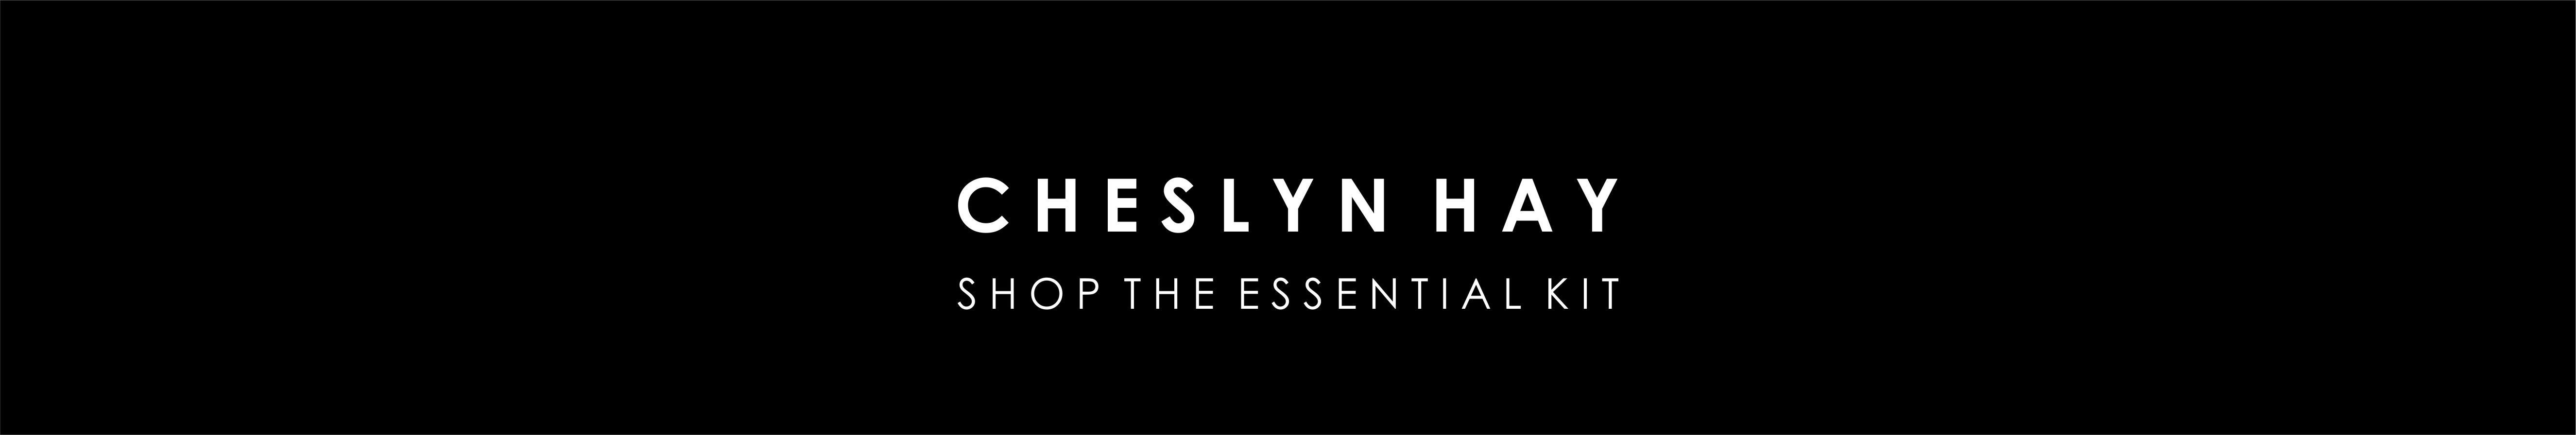 cheslyn-hay-front-banner.jpg